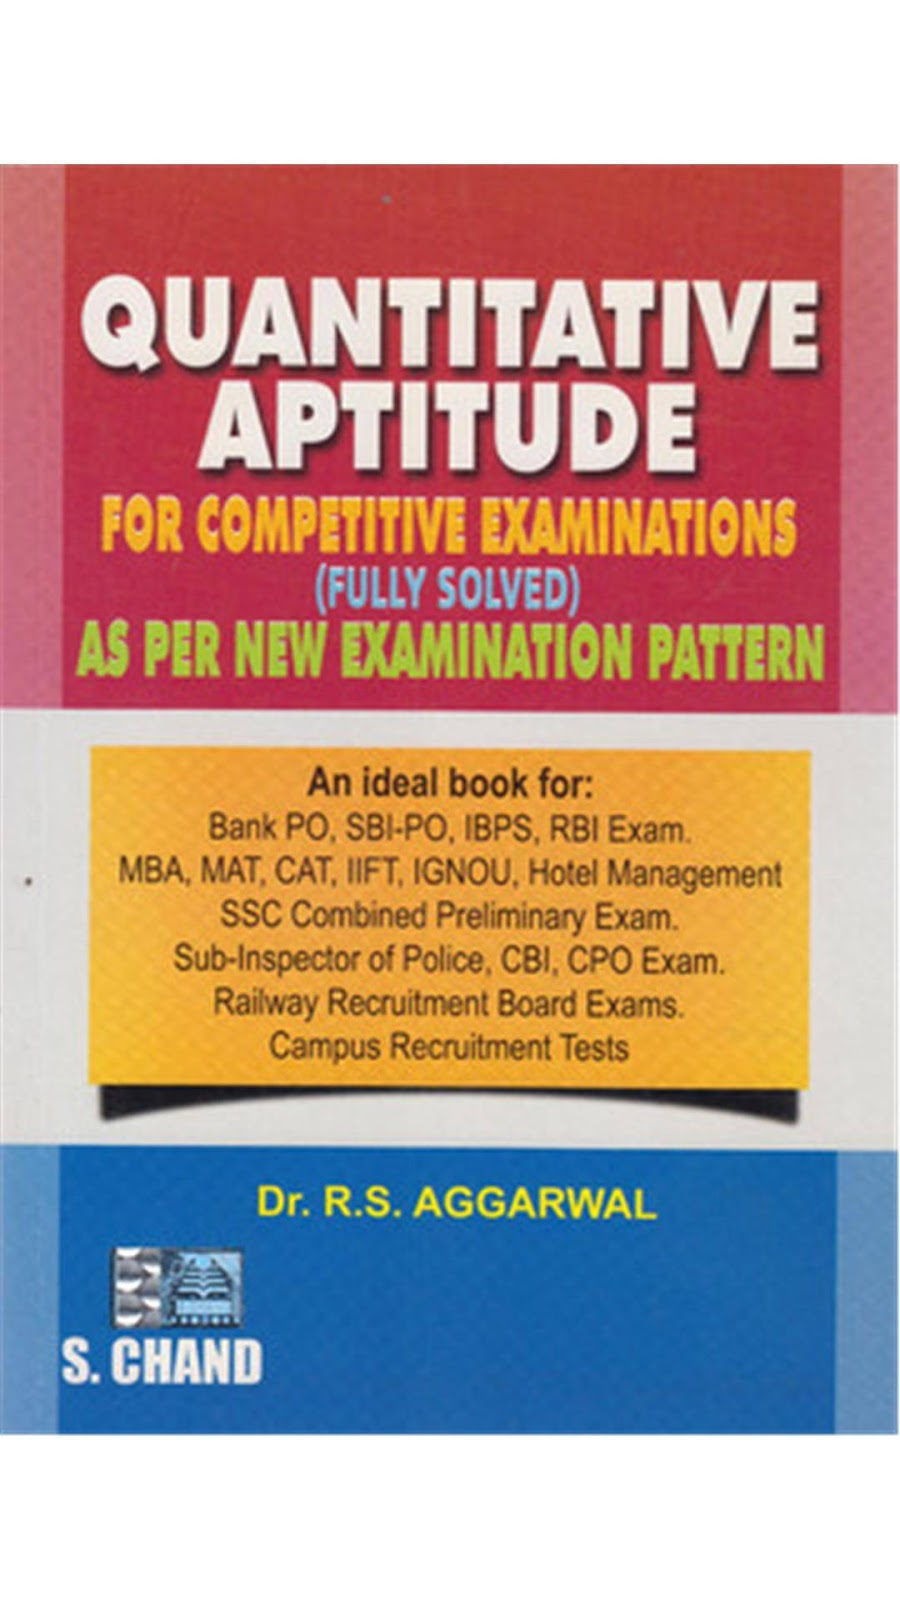 Quantitative Aptitude Fully Solved Rs Aggarwal Pdf 2012